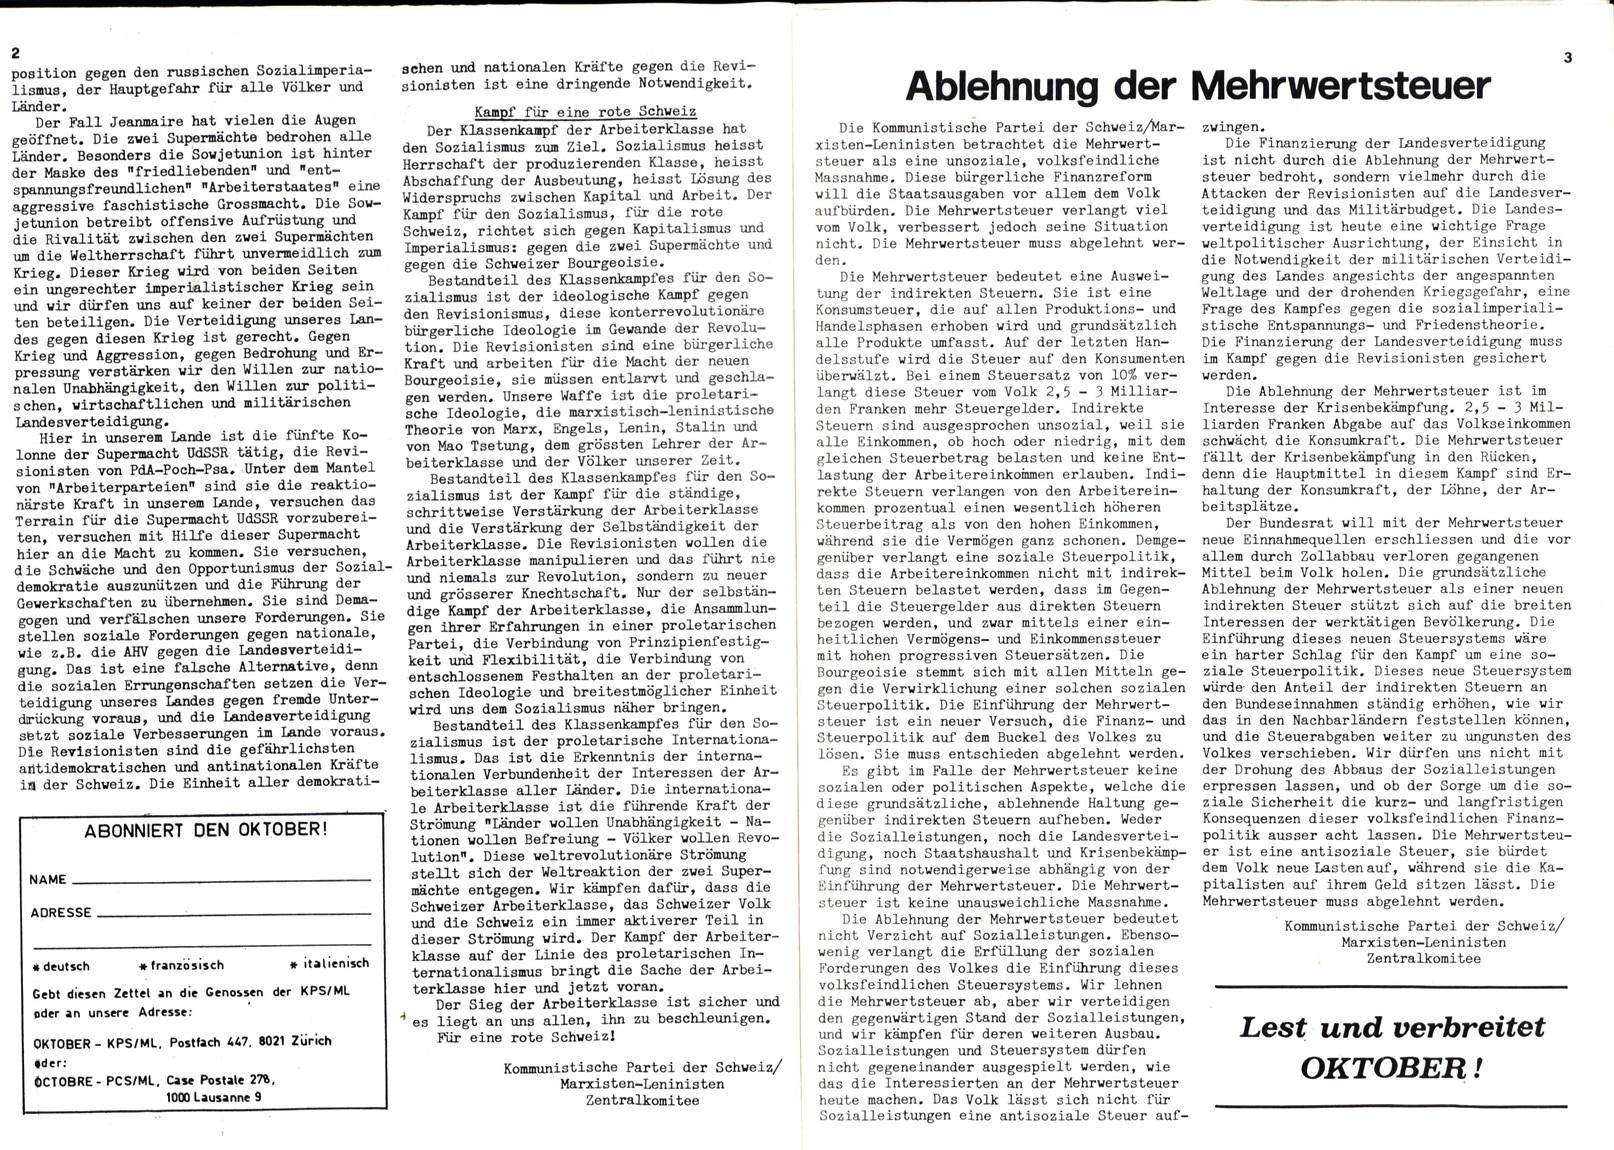 Schweiz_KPSML_Oktober_19770500_110_002